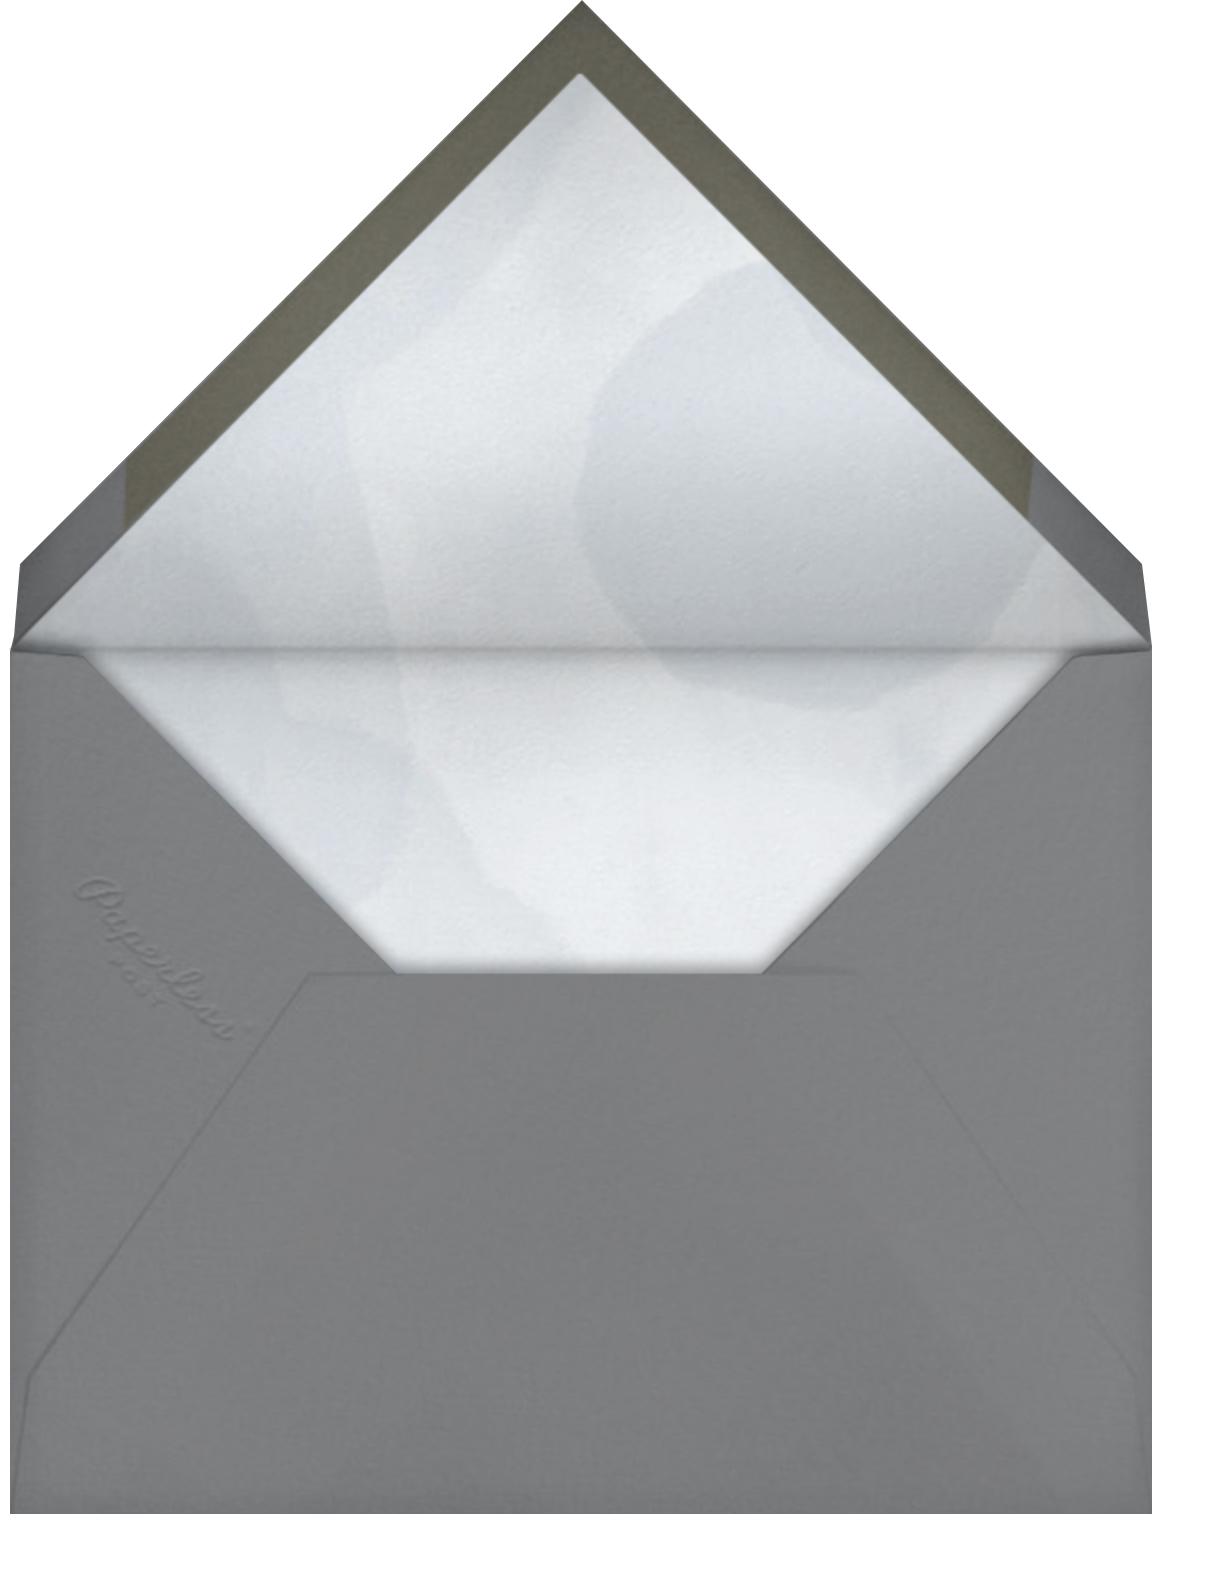 May Belle - Gray Green - Paperless Post - Baby shower - envelope back